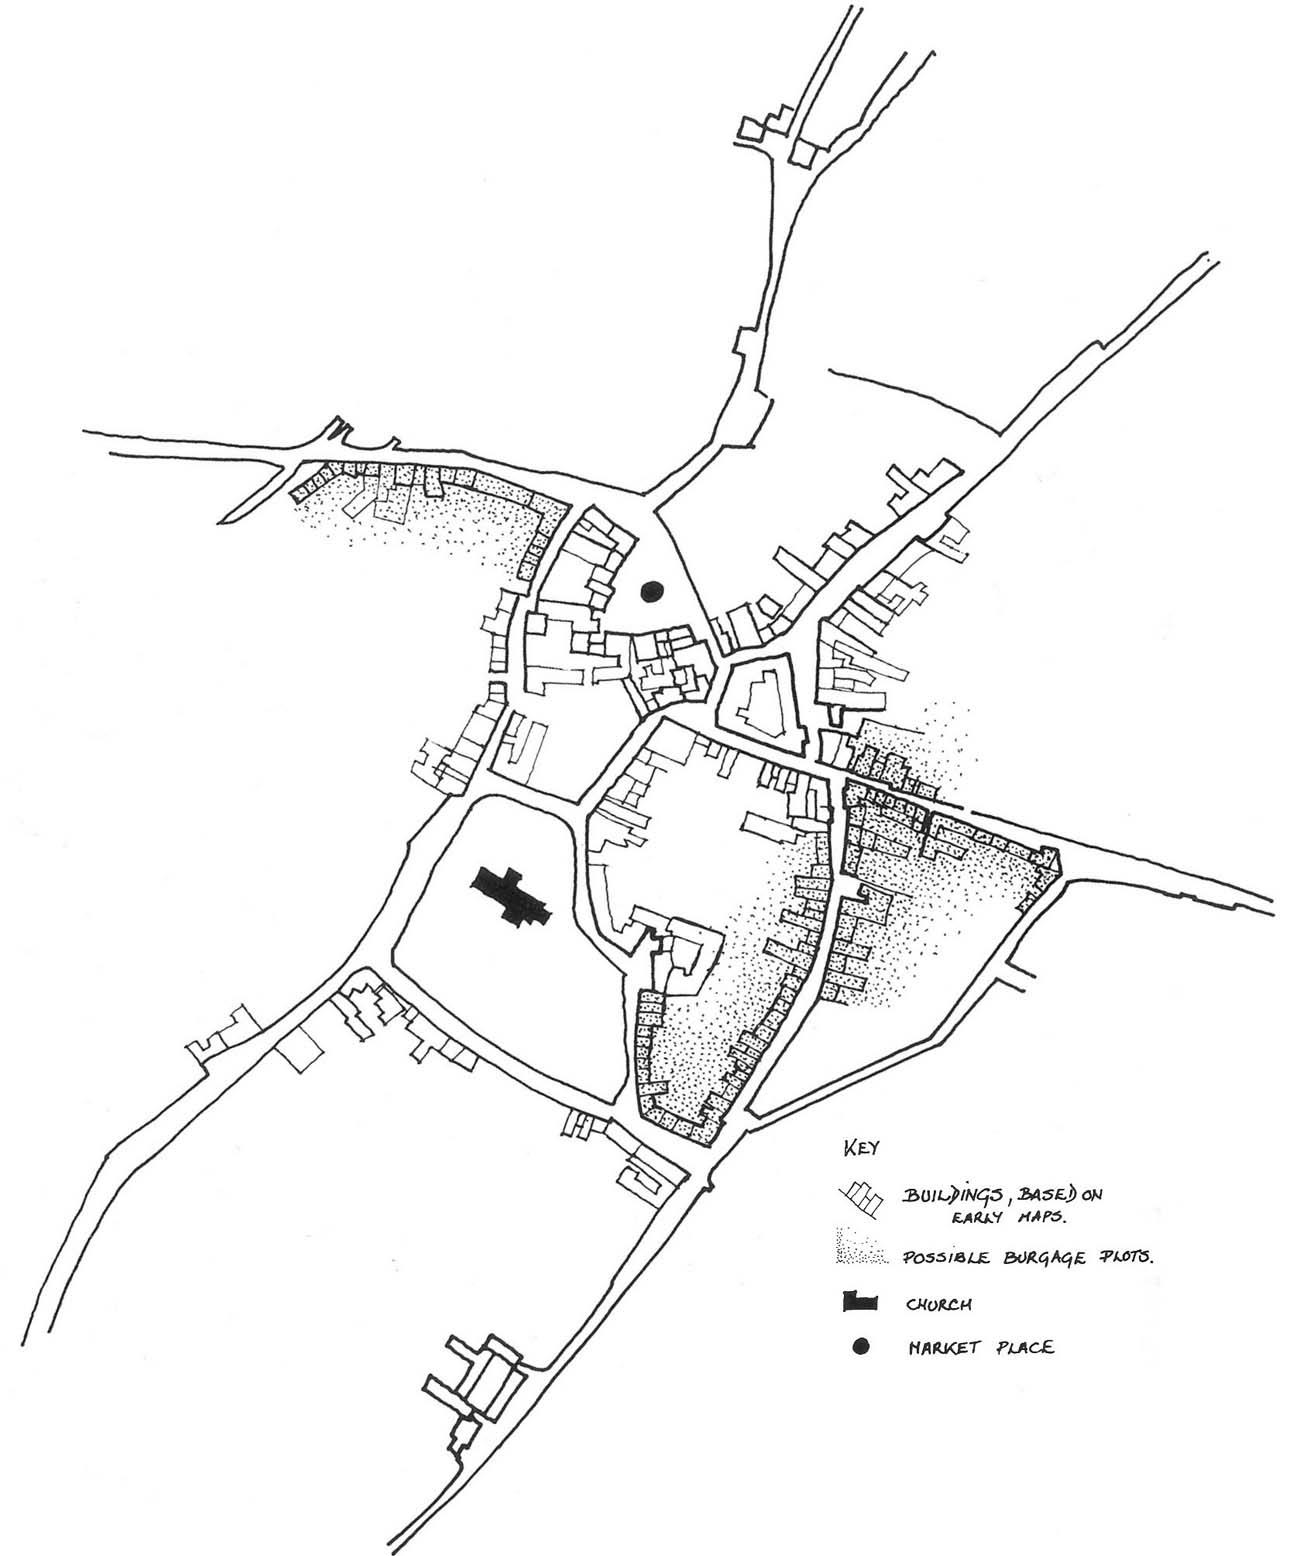 places u2013 axminster heritage